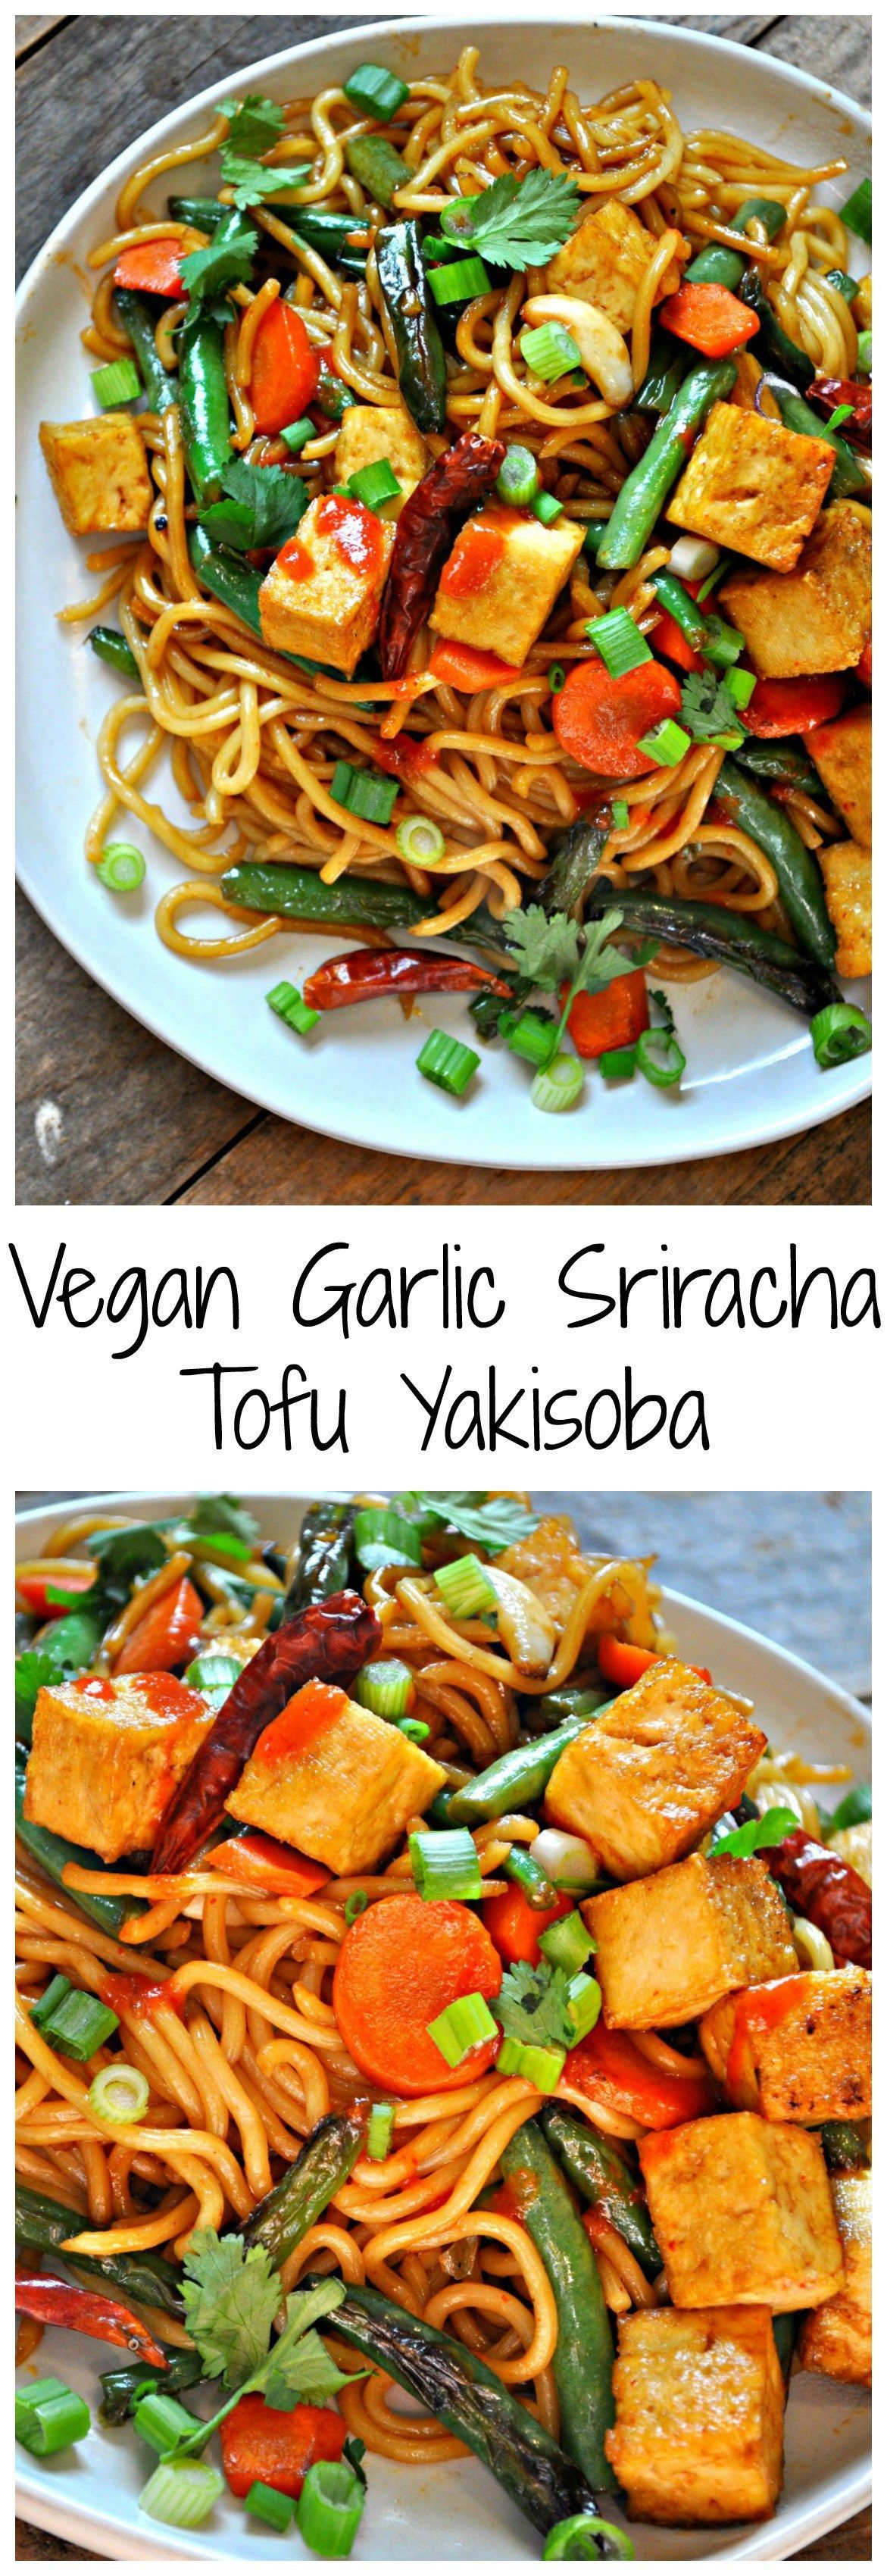 A Healthy And Quick Meal, This Vegan Garlic Sriracha Tofu